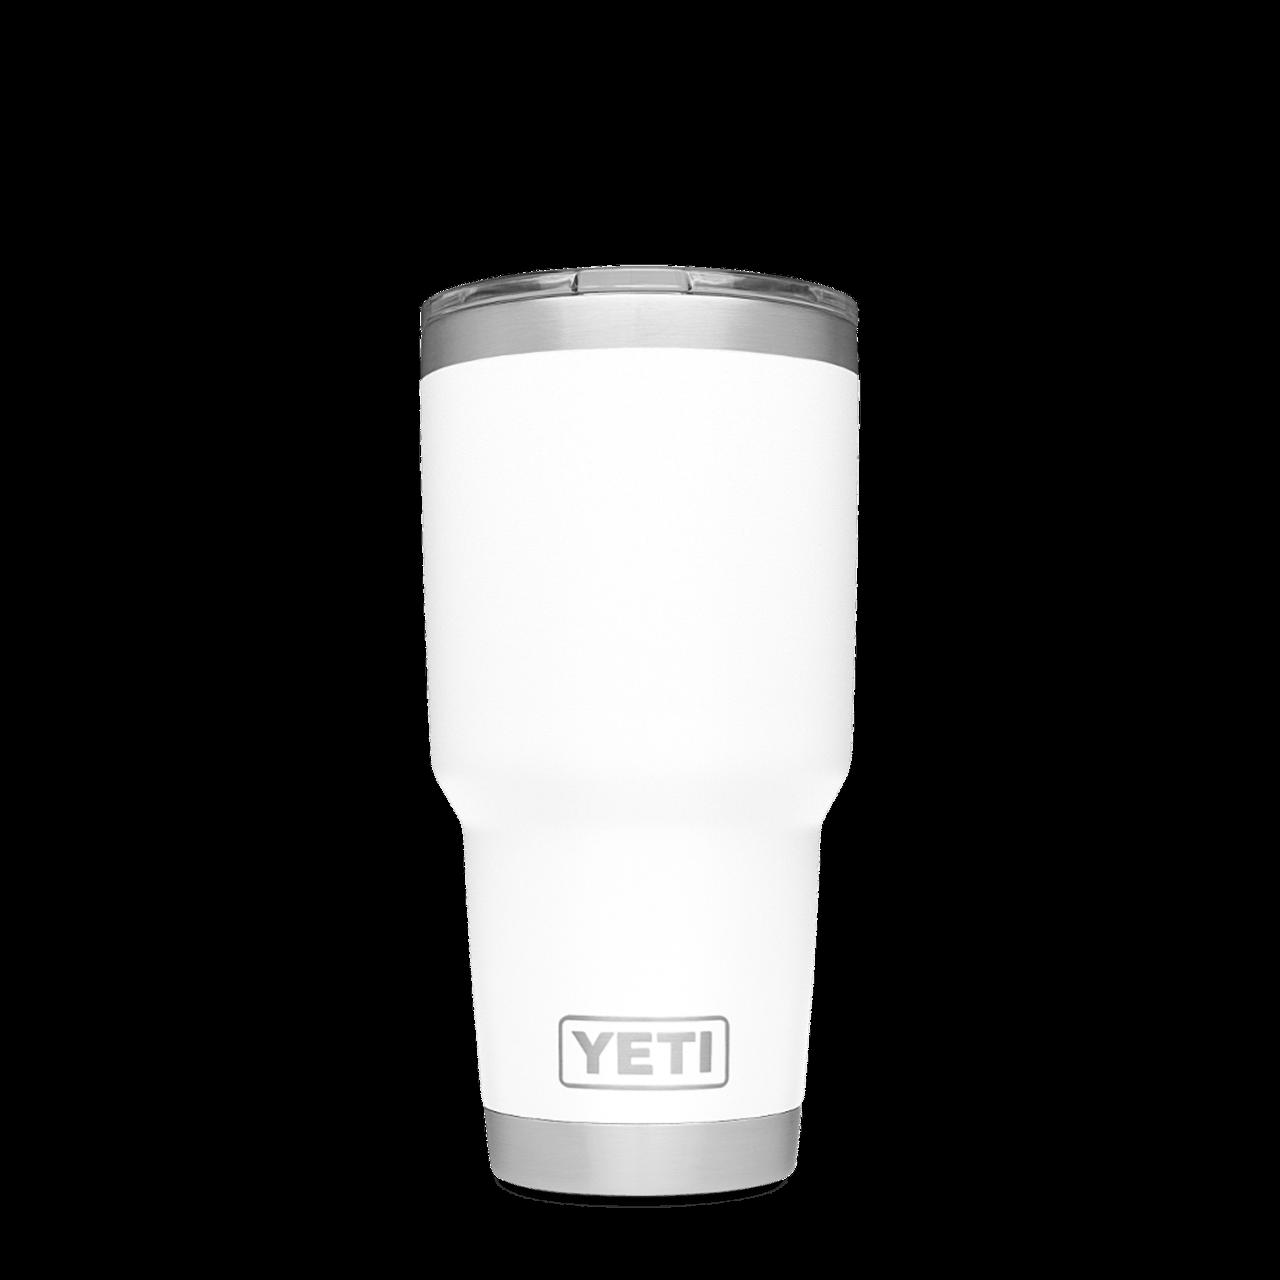 YETI Rambler 30oz - white